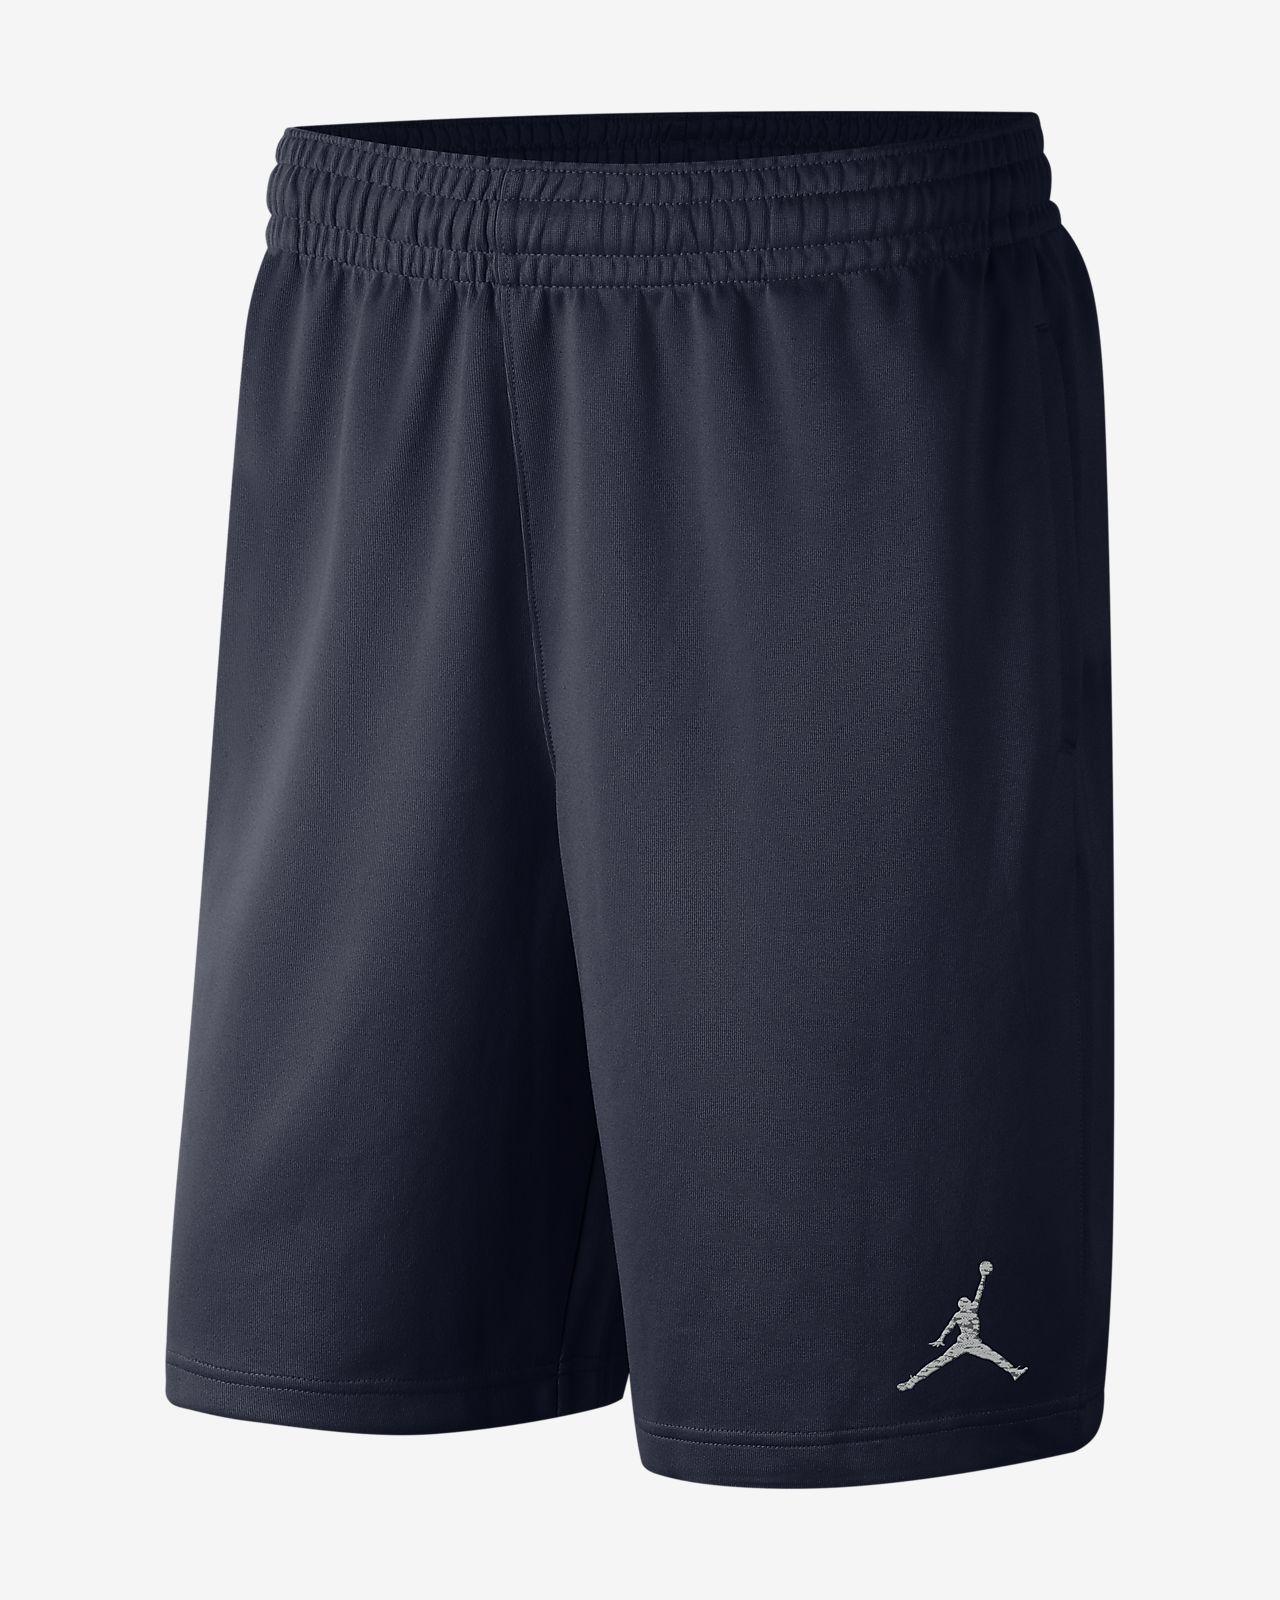 Jordan College Spotlight (Michigan) Men's Shorts